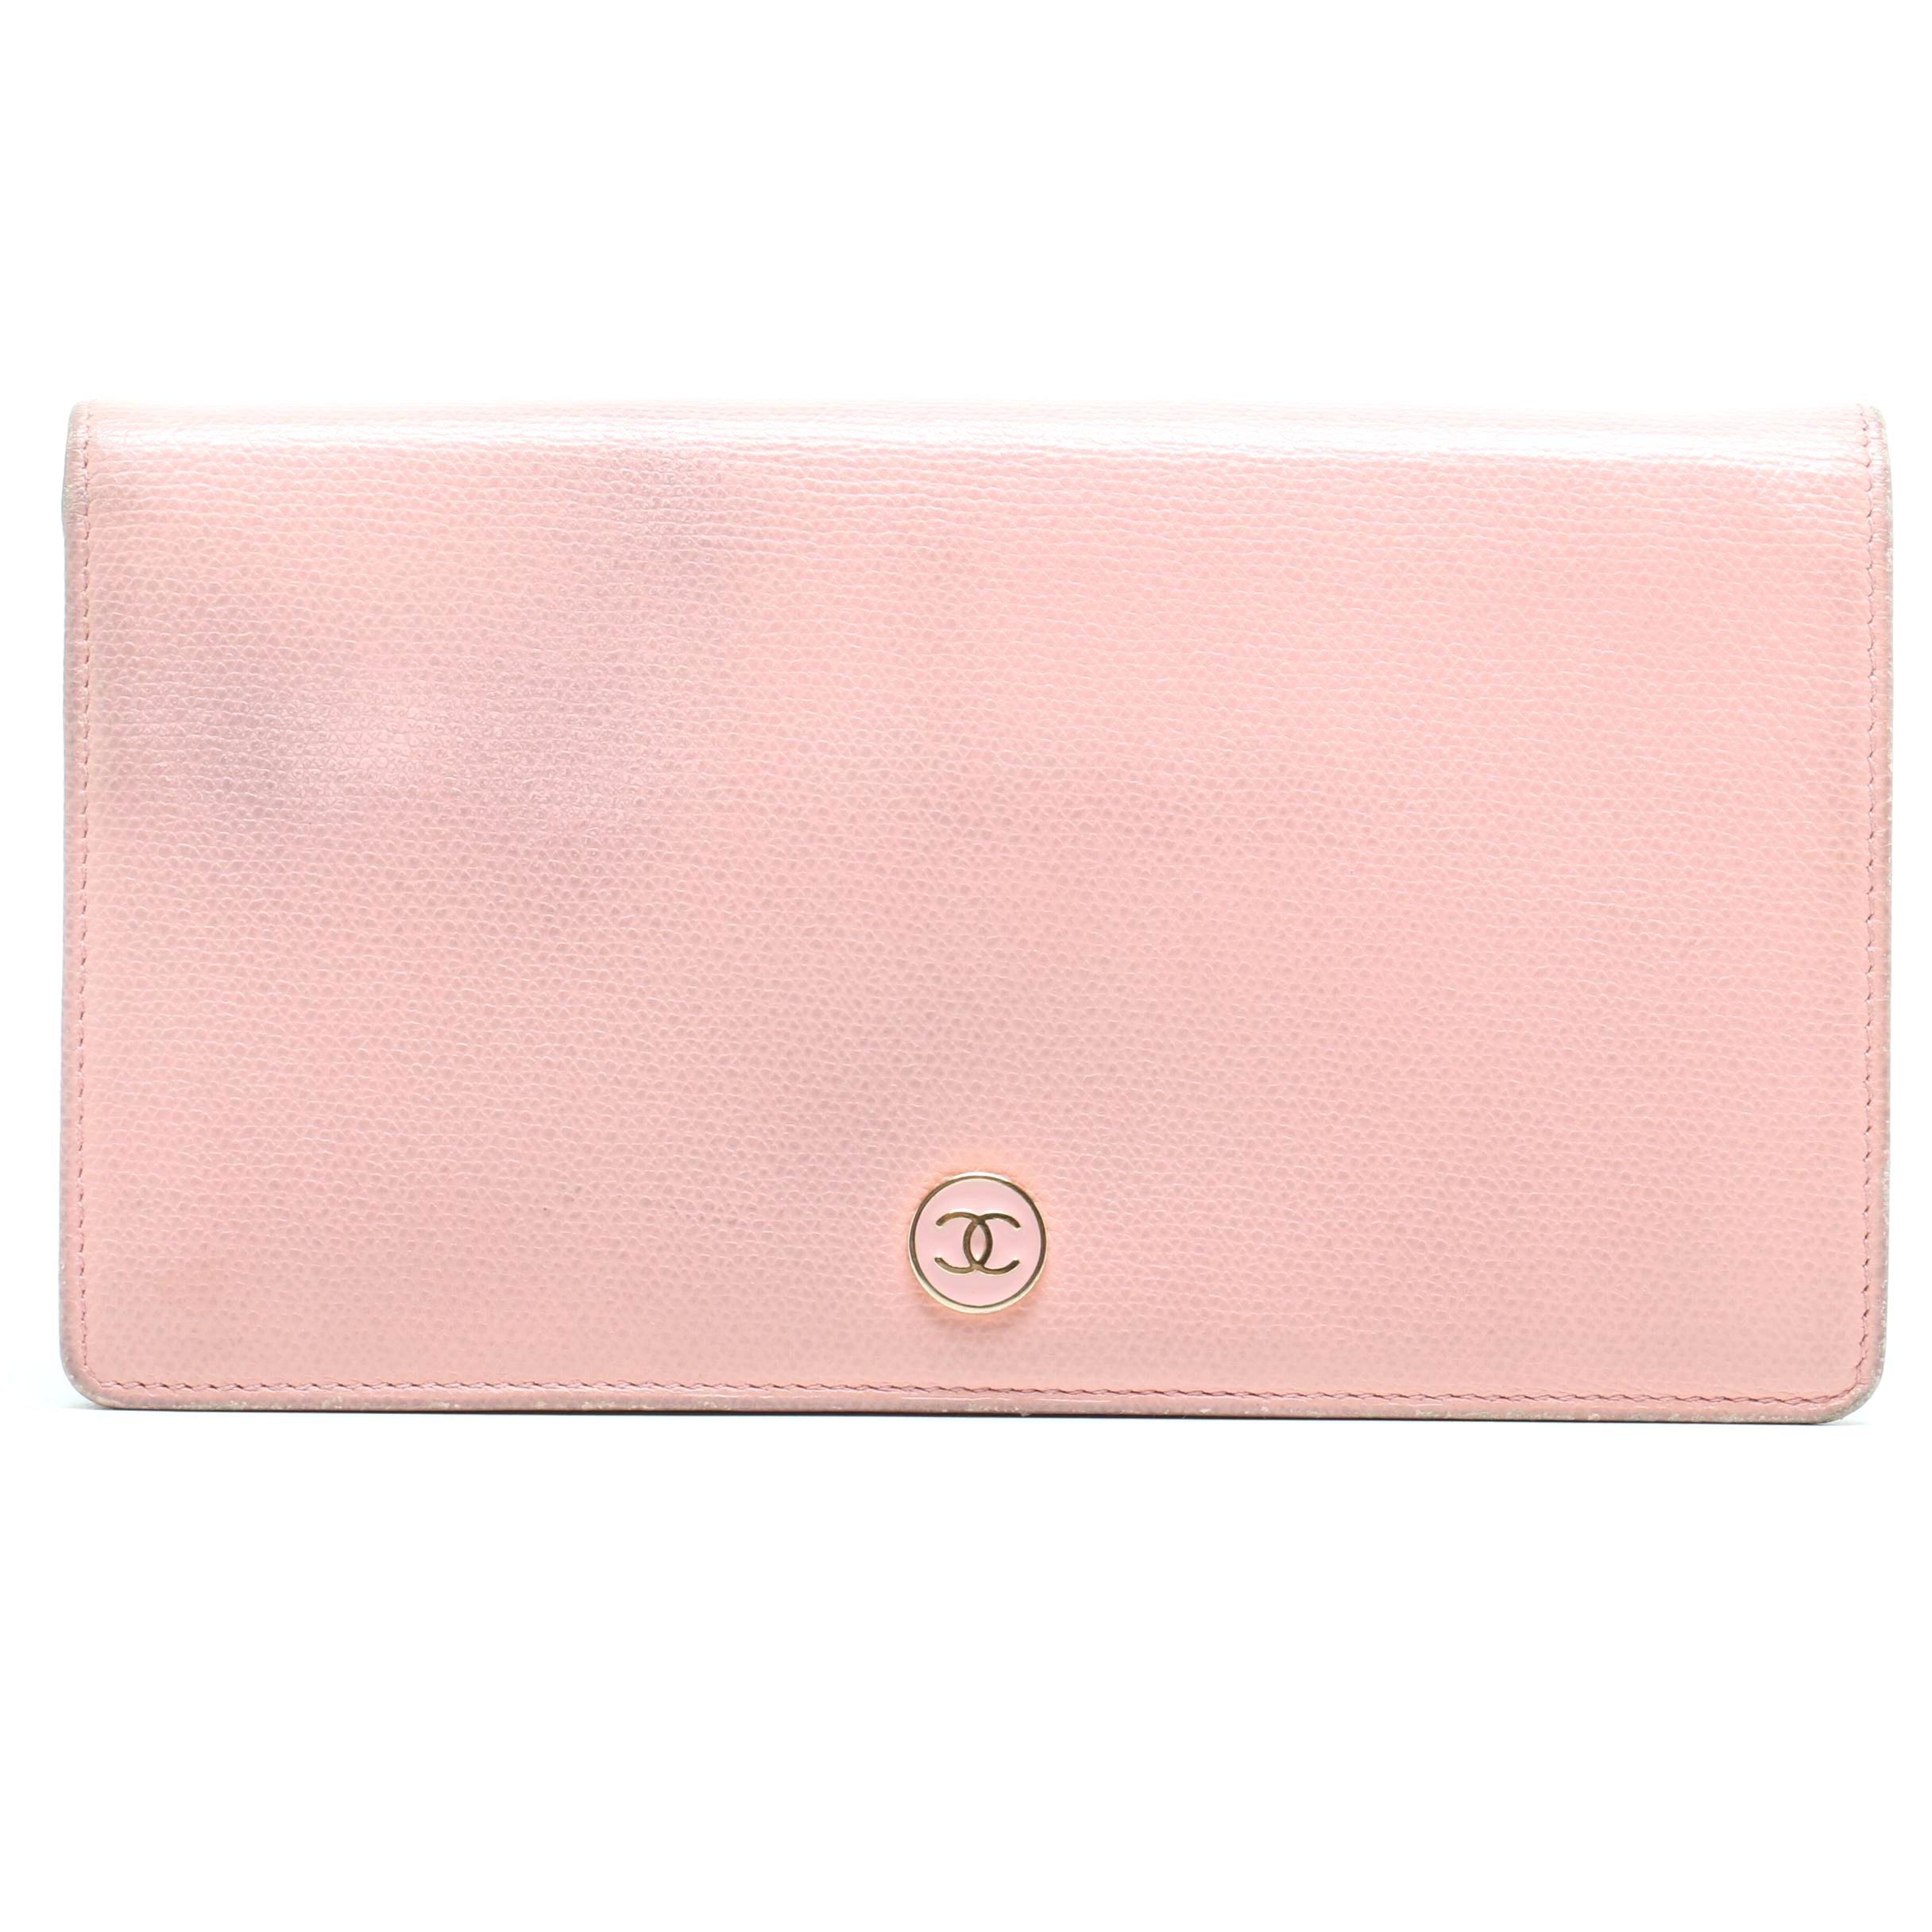 Chanel Blush Peach Caviar Leather Long Bifold Wallet